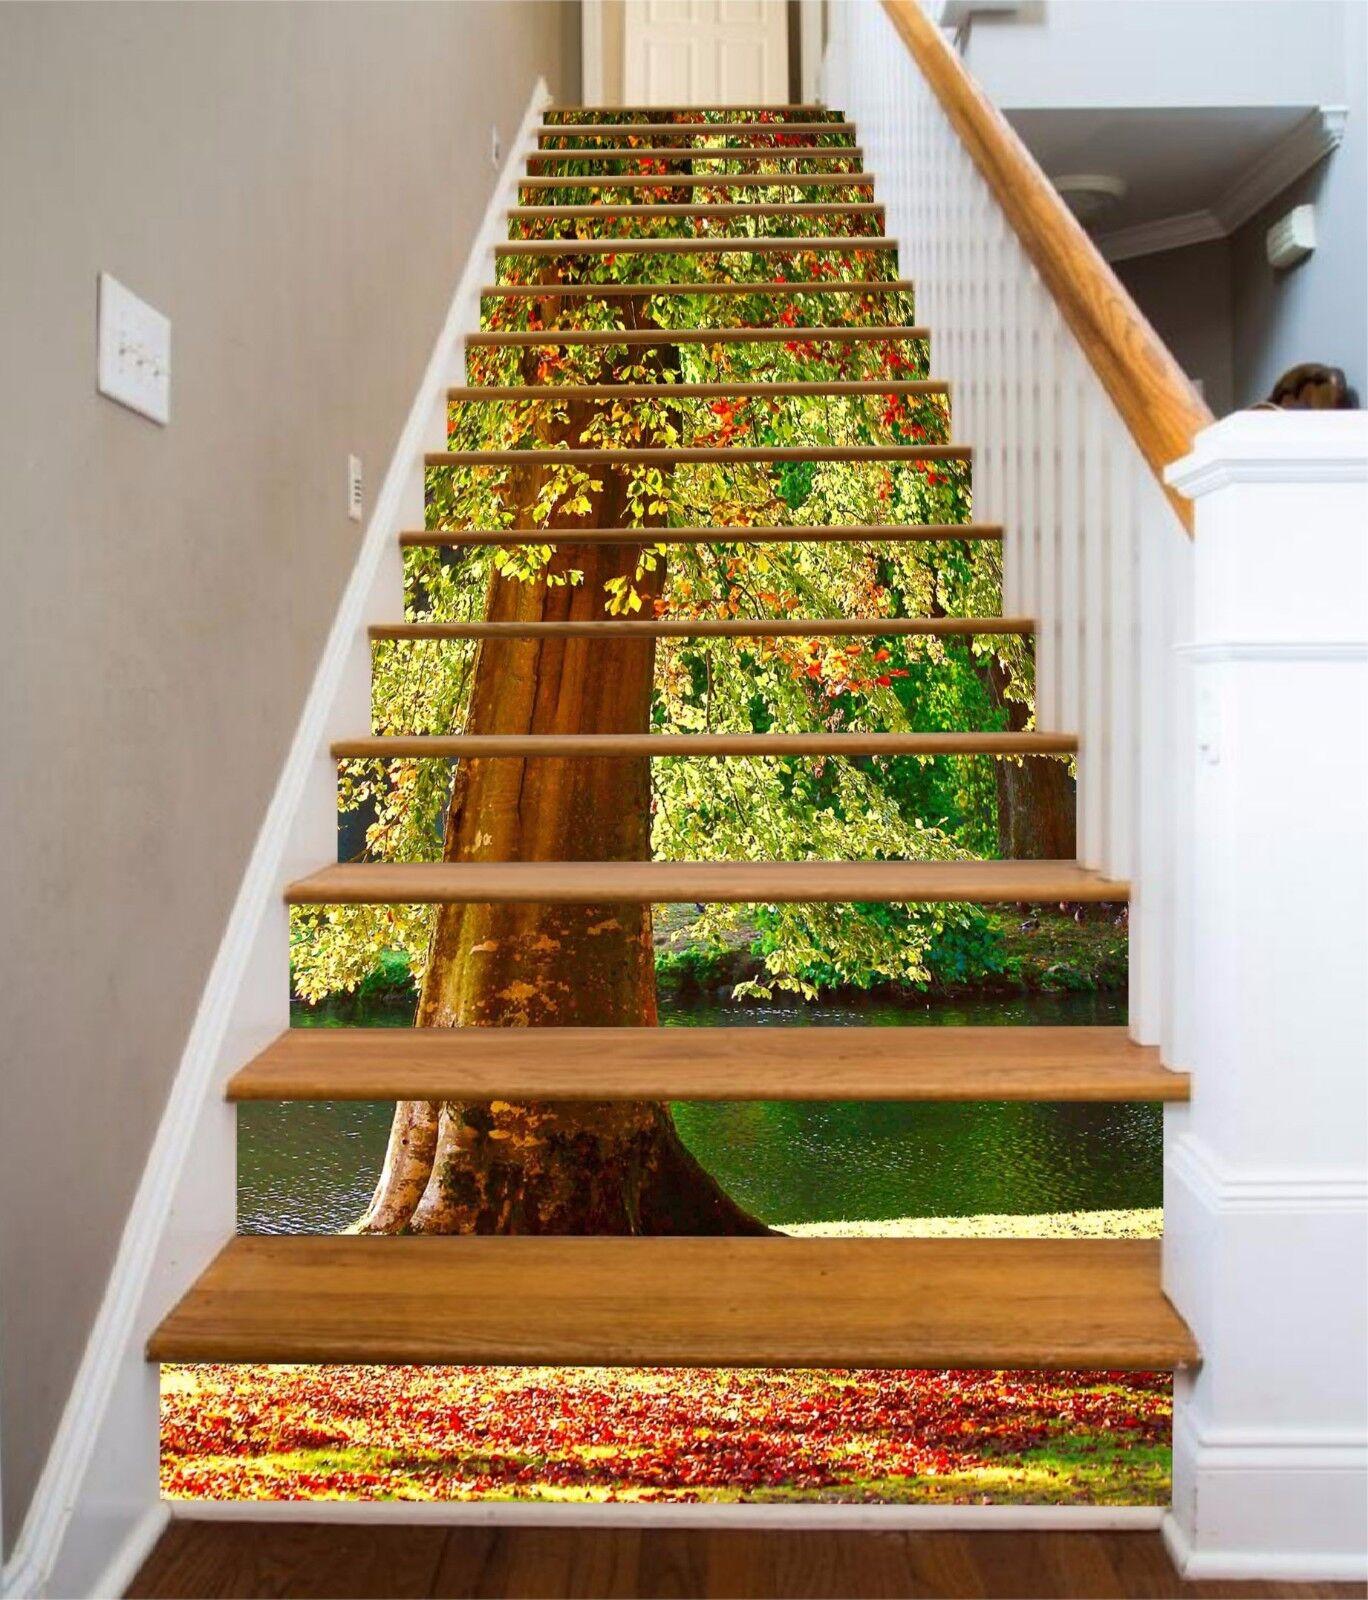 3D Nature Tree 876 Stair Risers Decoration Photo Mural Vinyl Decal WandPapier AU